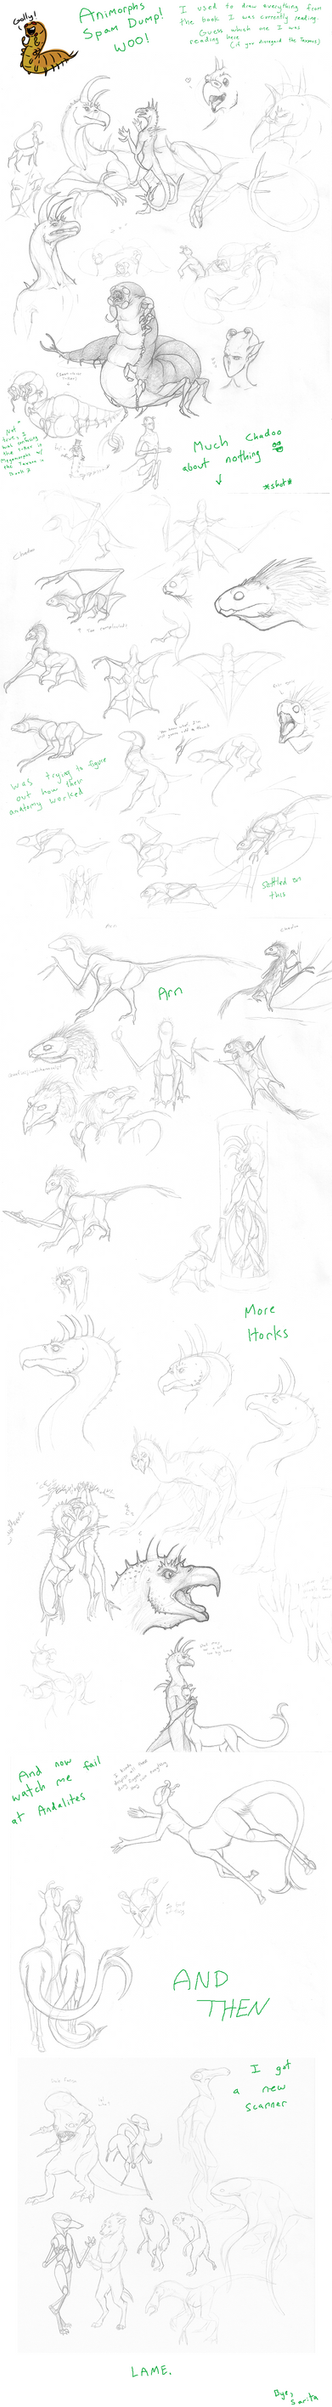 Animorphs Doodle Dump by SaritaWolff